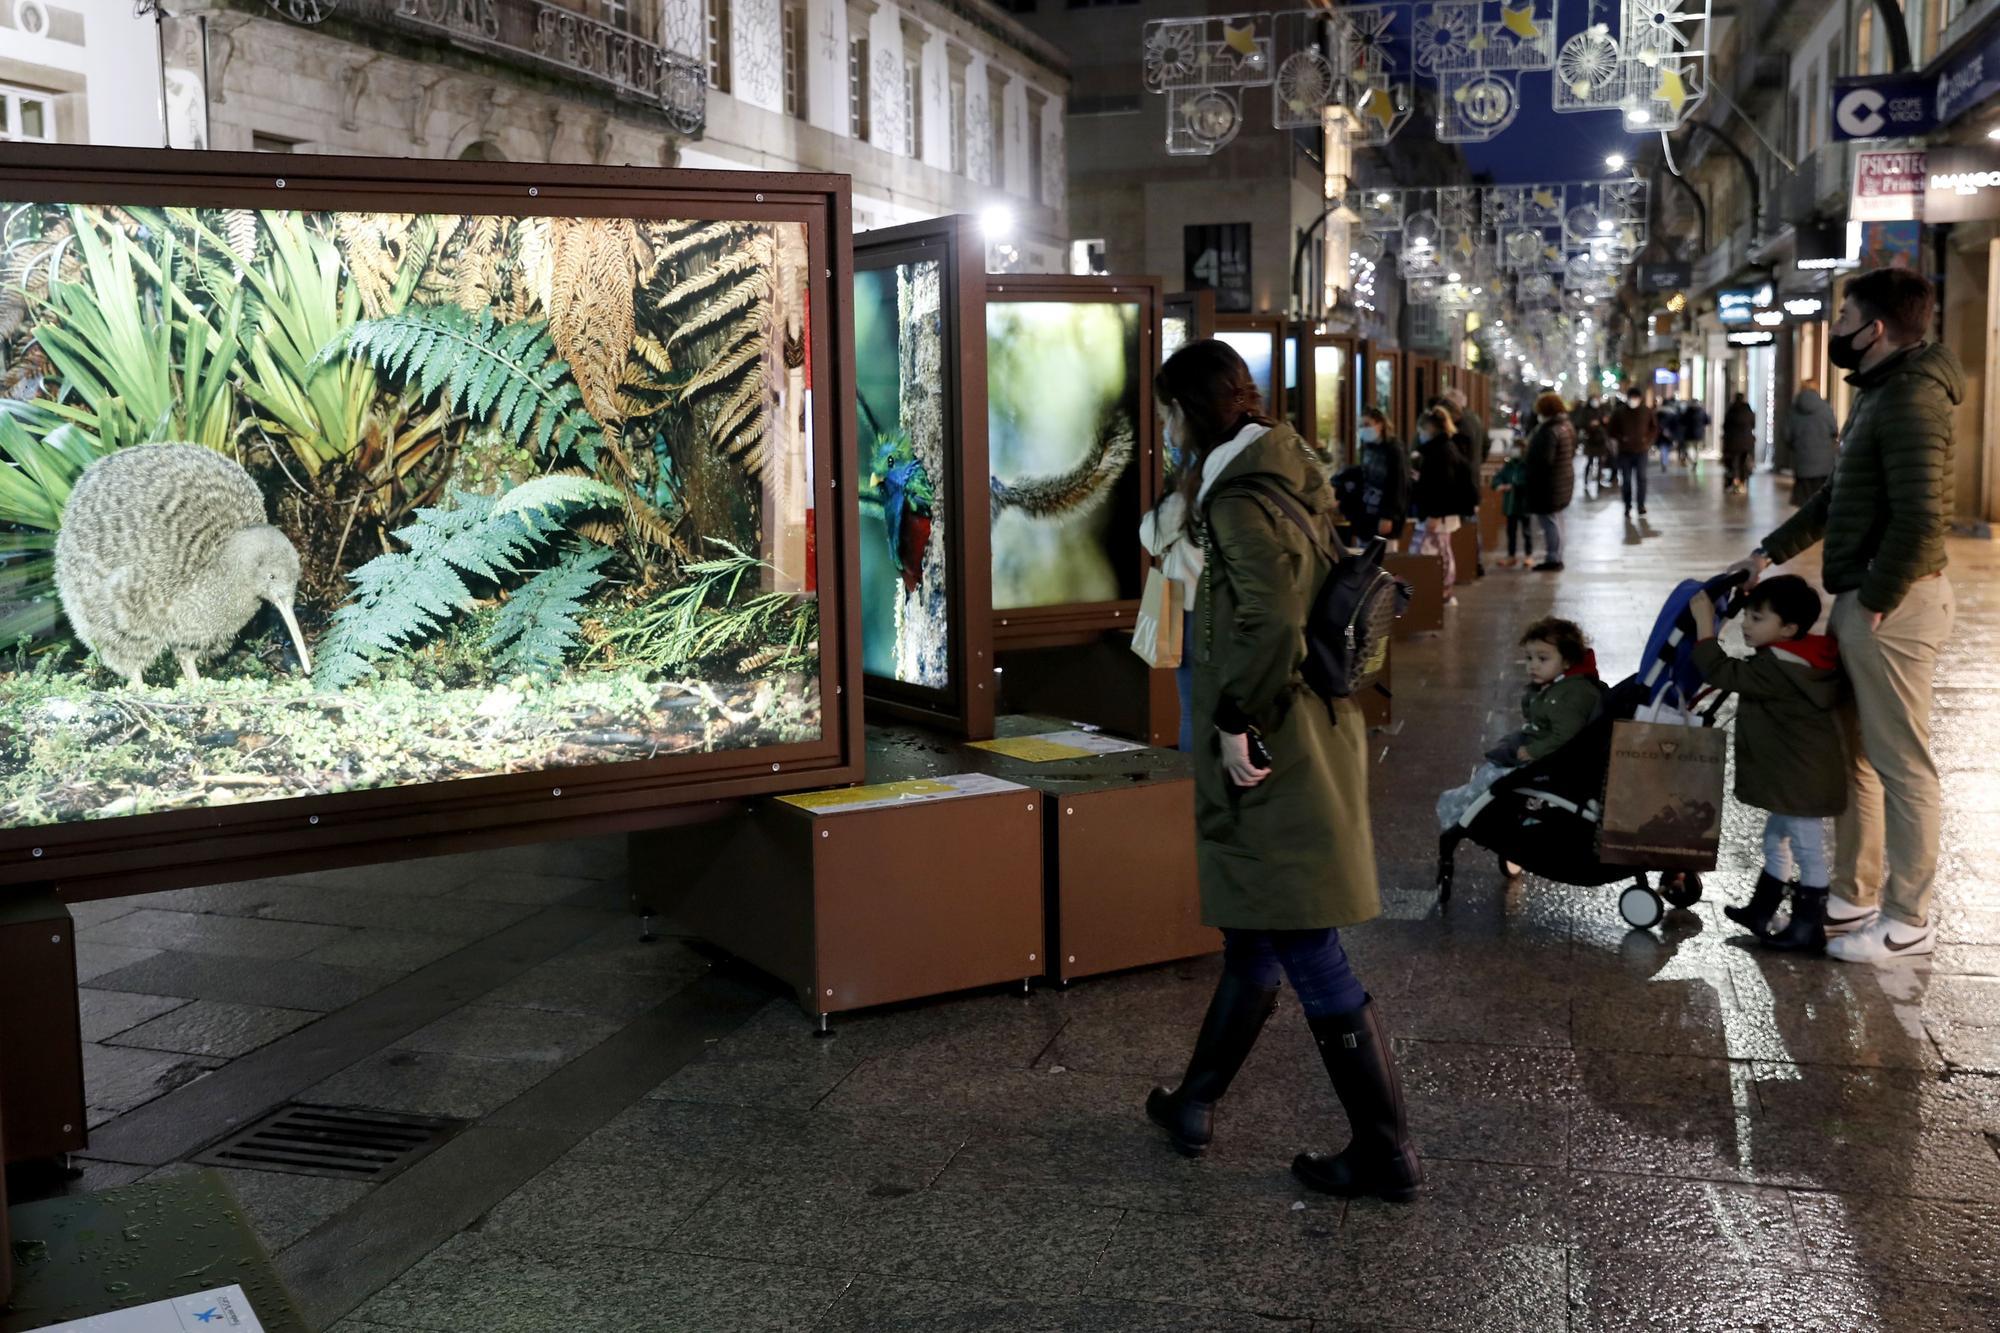 La naturaleza de National Geographic a pie de calle en Vigo